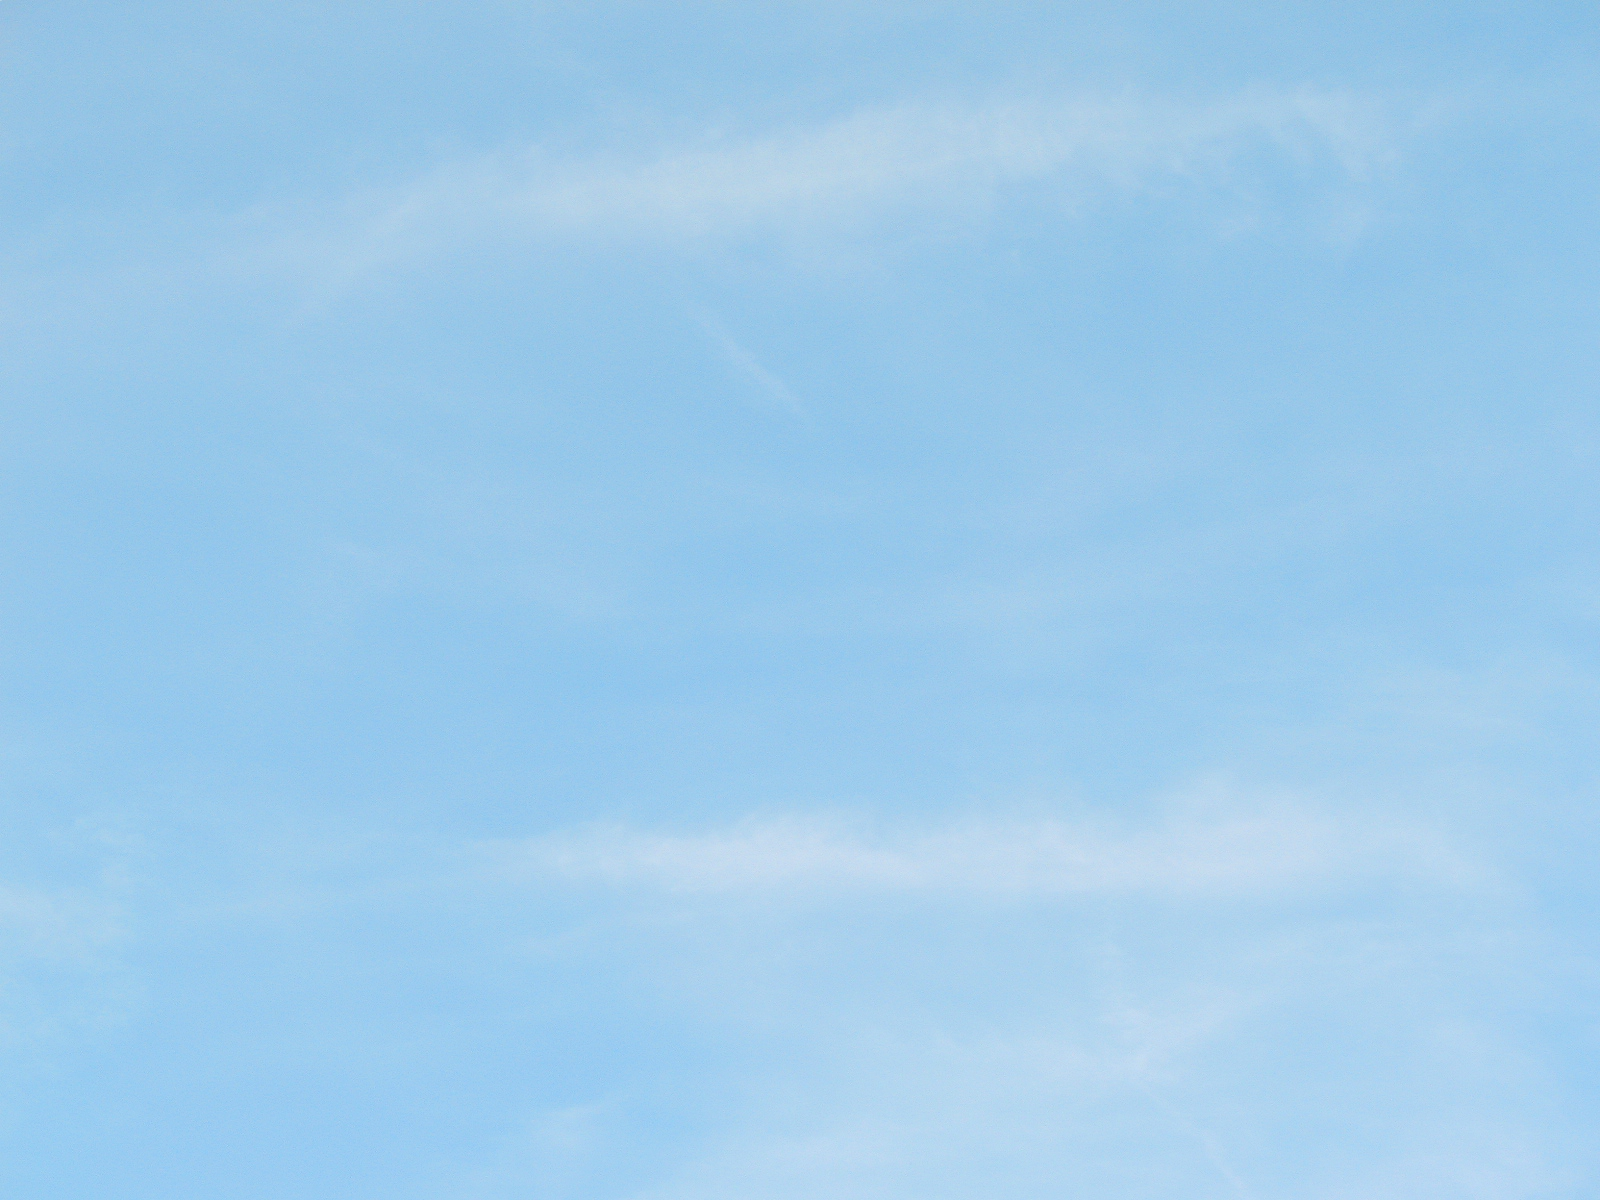 File:Sky.jpg - Wikimedia Commons